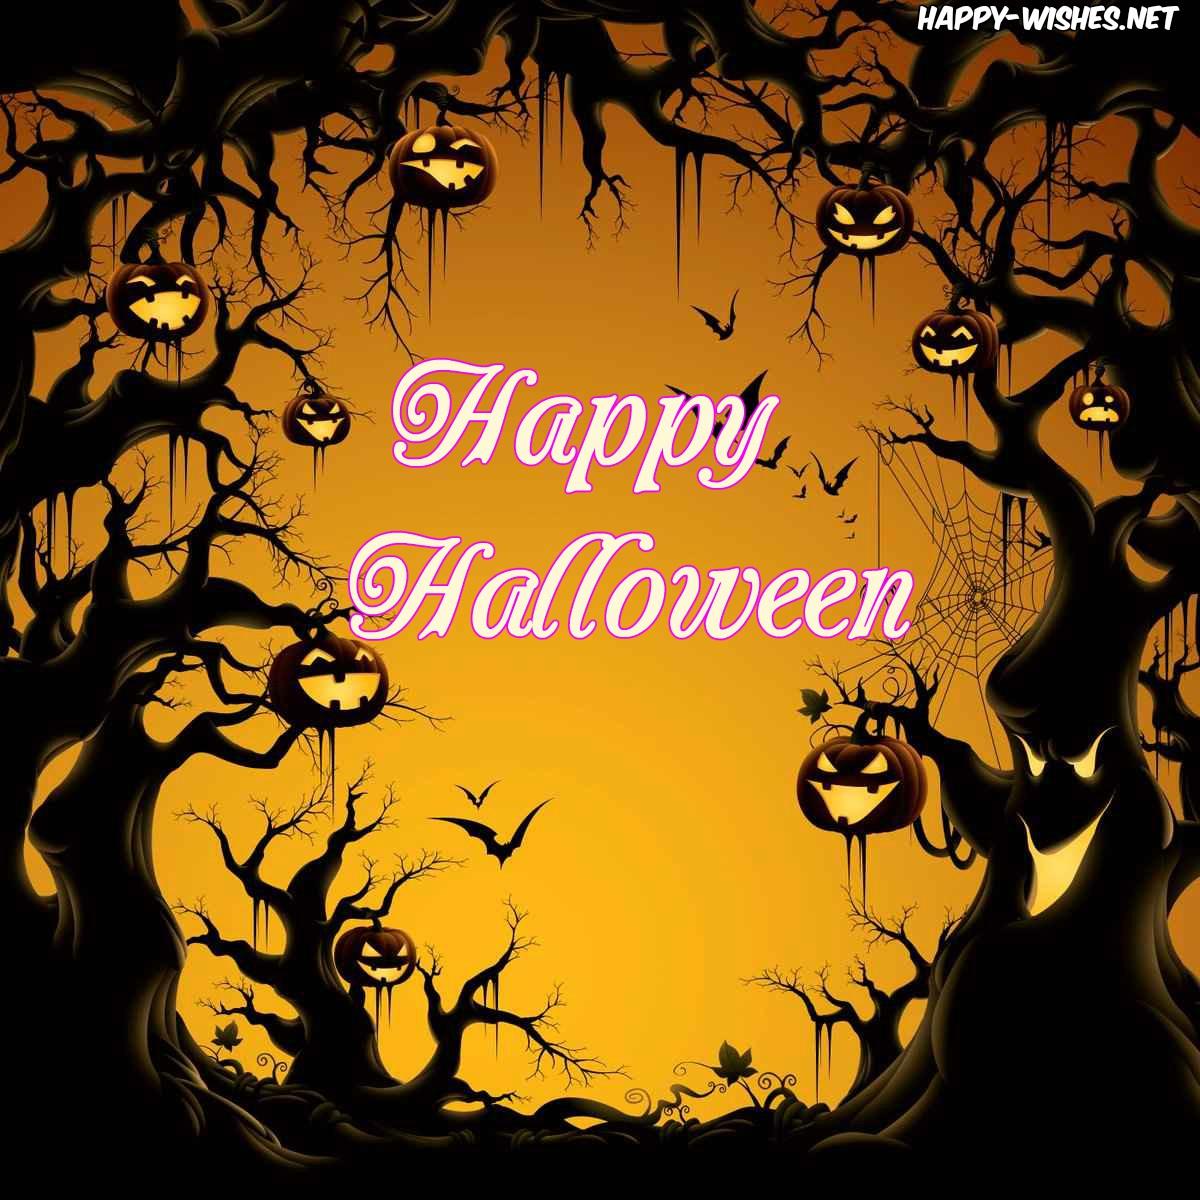 Happy Halloween Hd Images